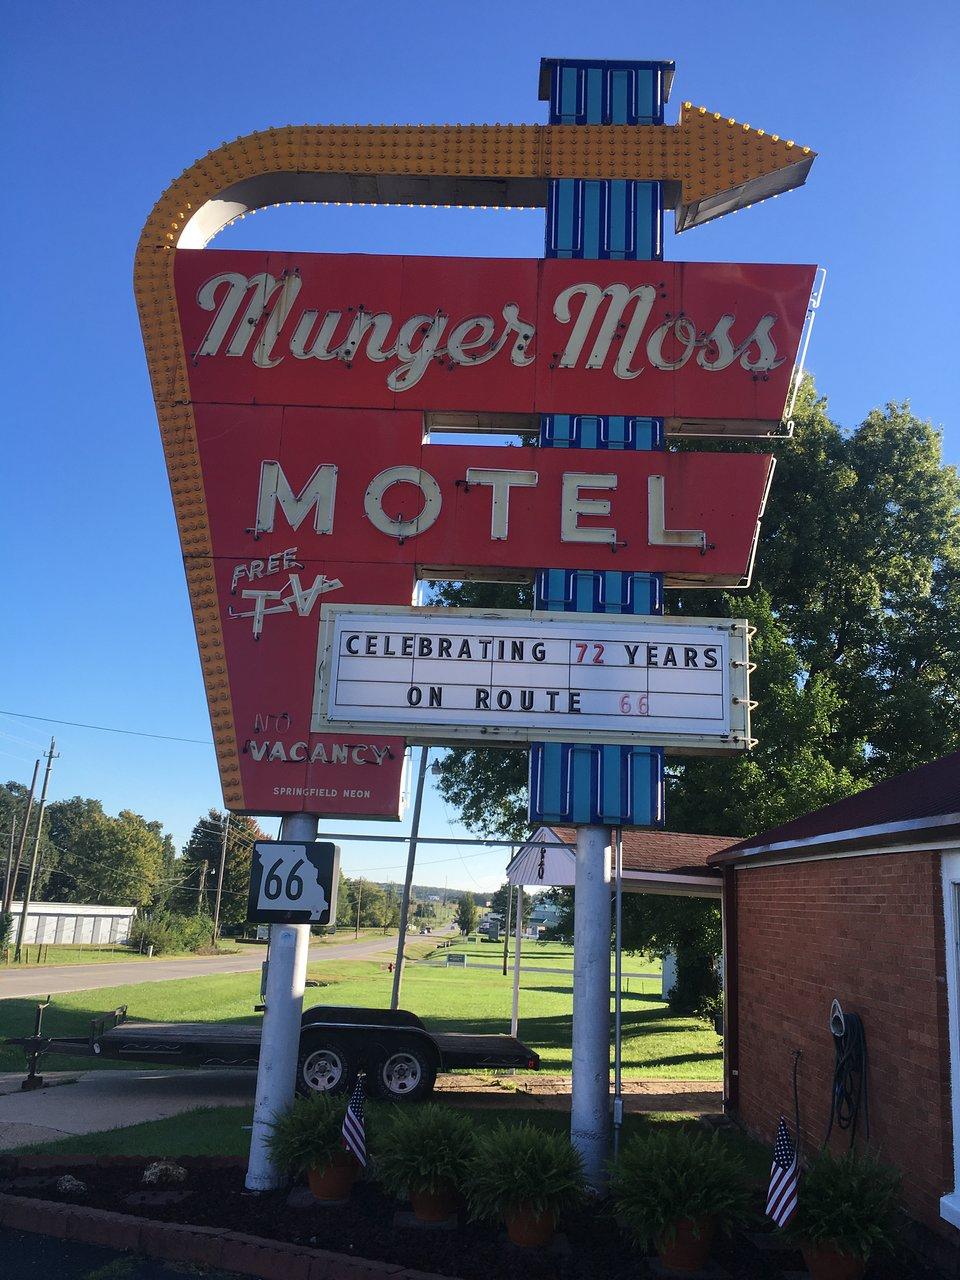 munger moss motel updated 2019 reviews lebanon mo tripadvisor rh tripadvisor com